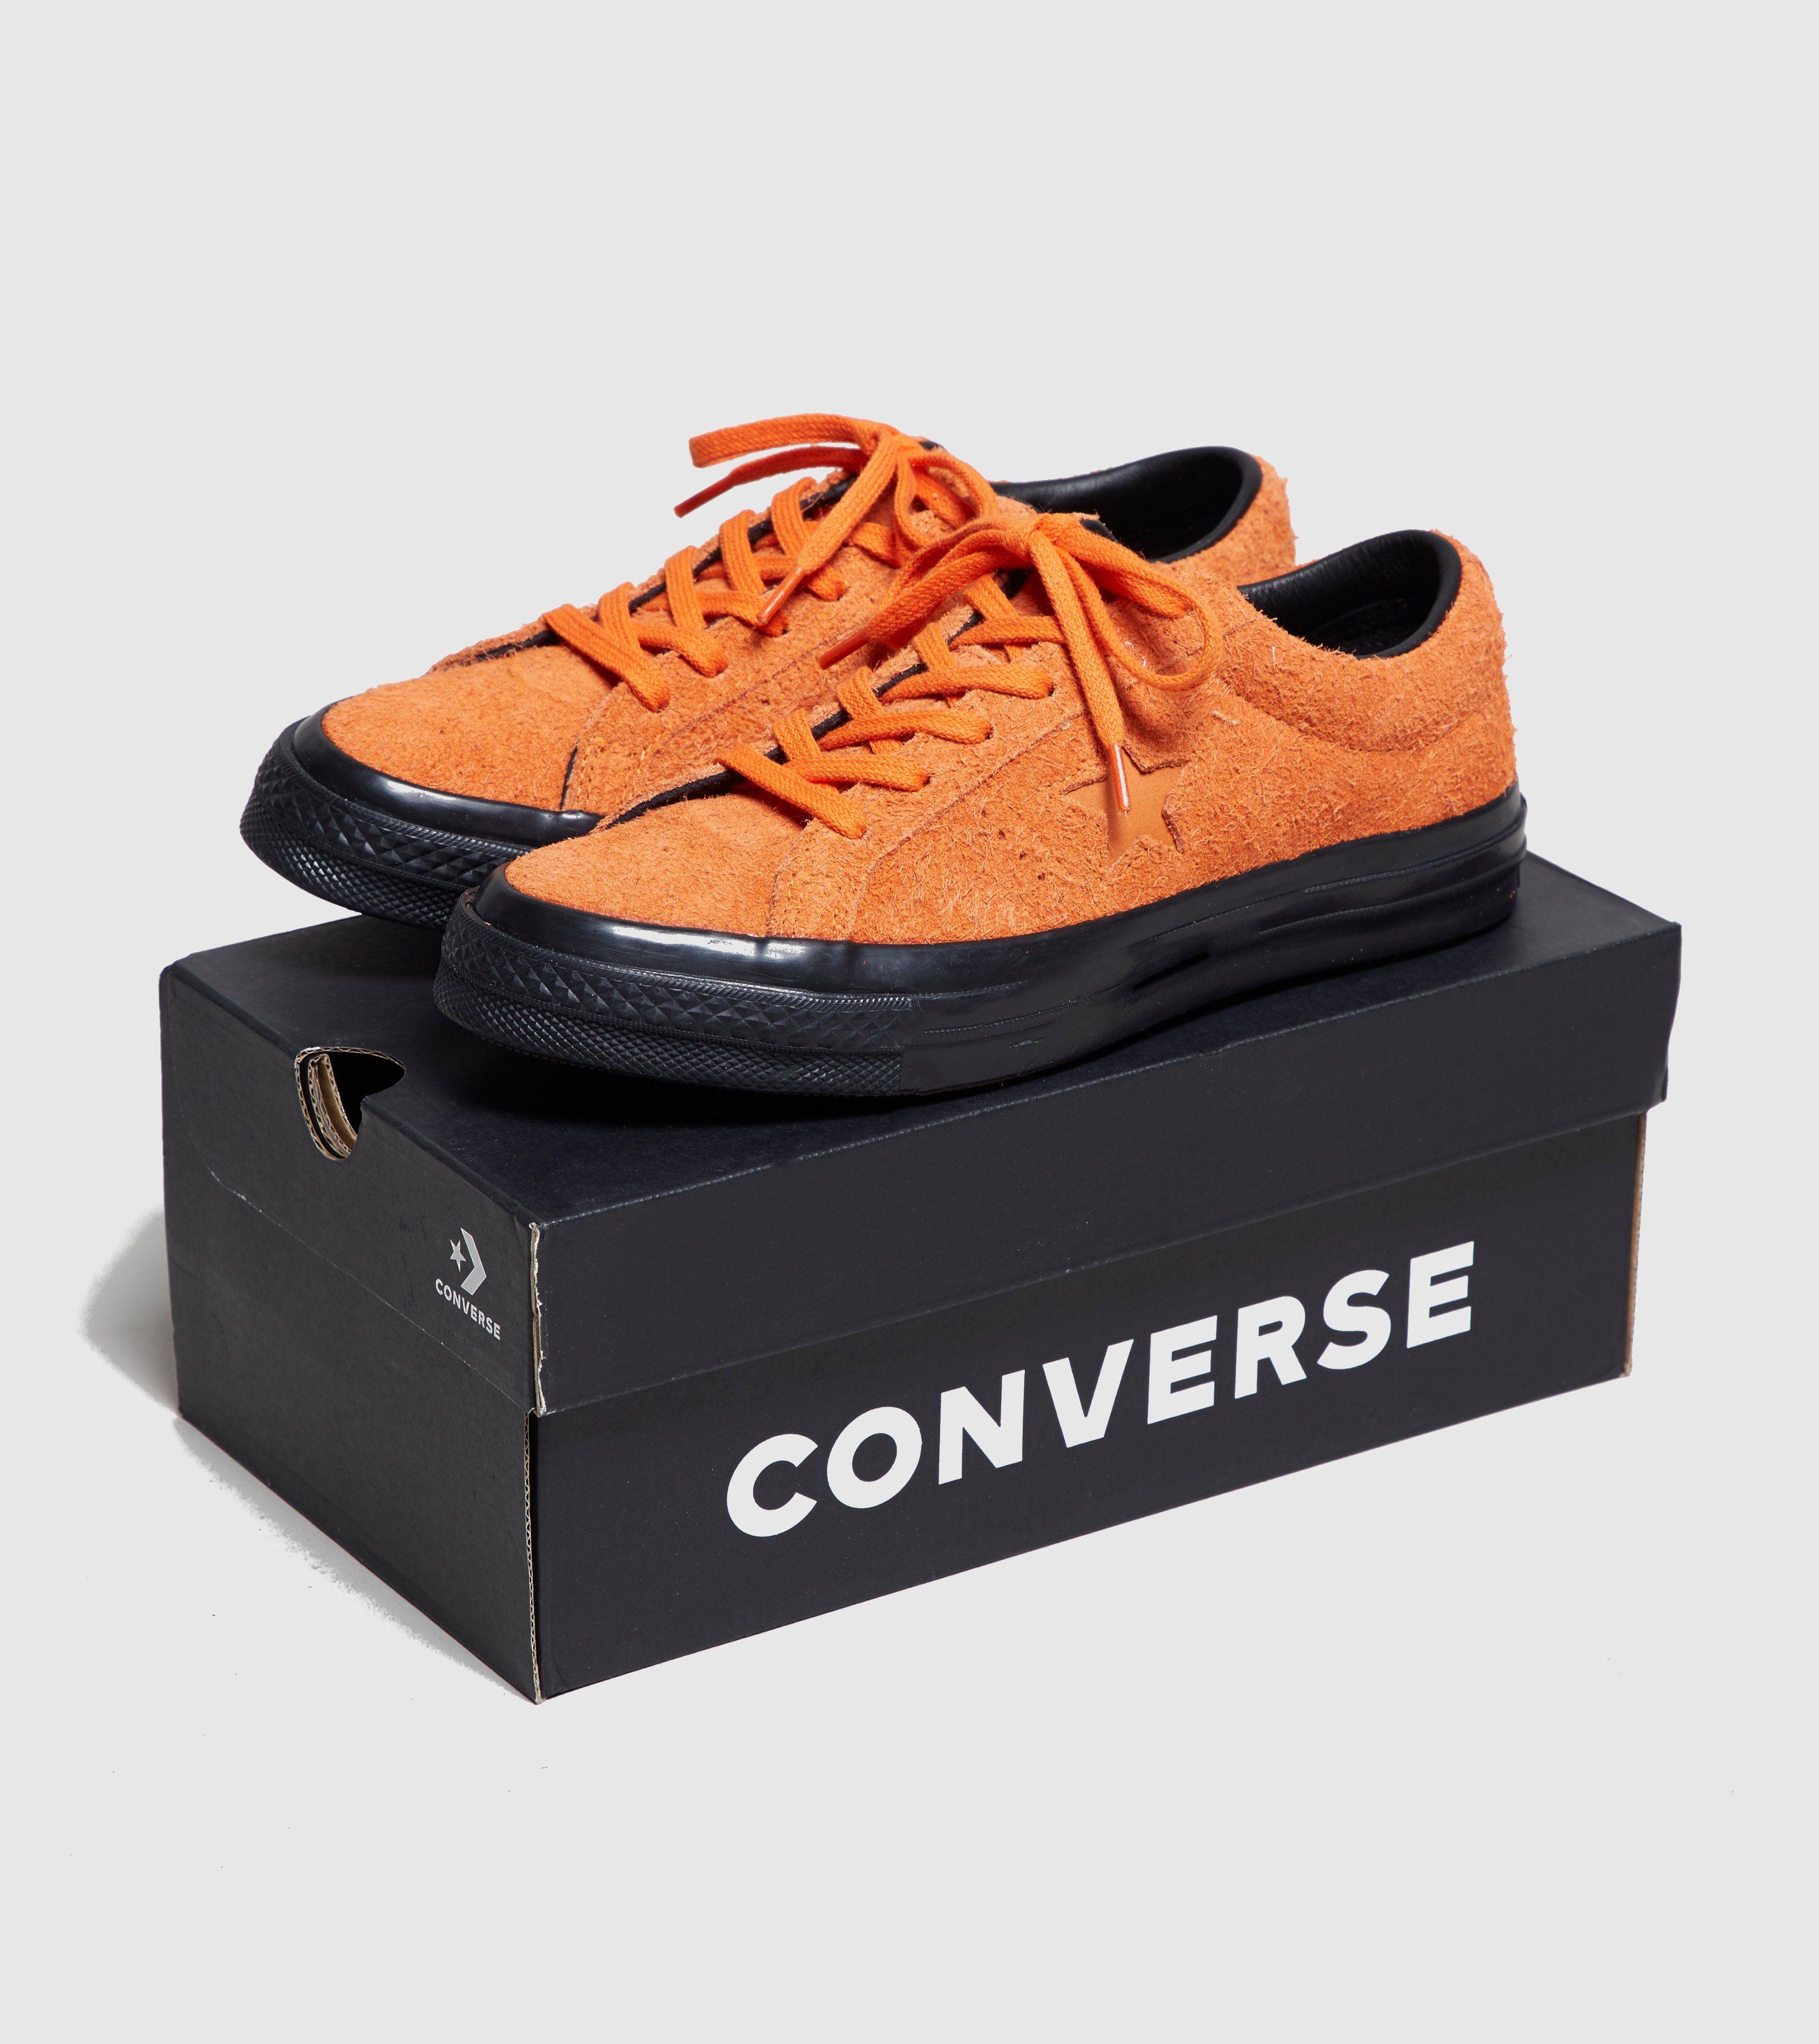 Converse One Star Women's